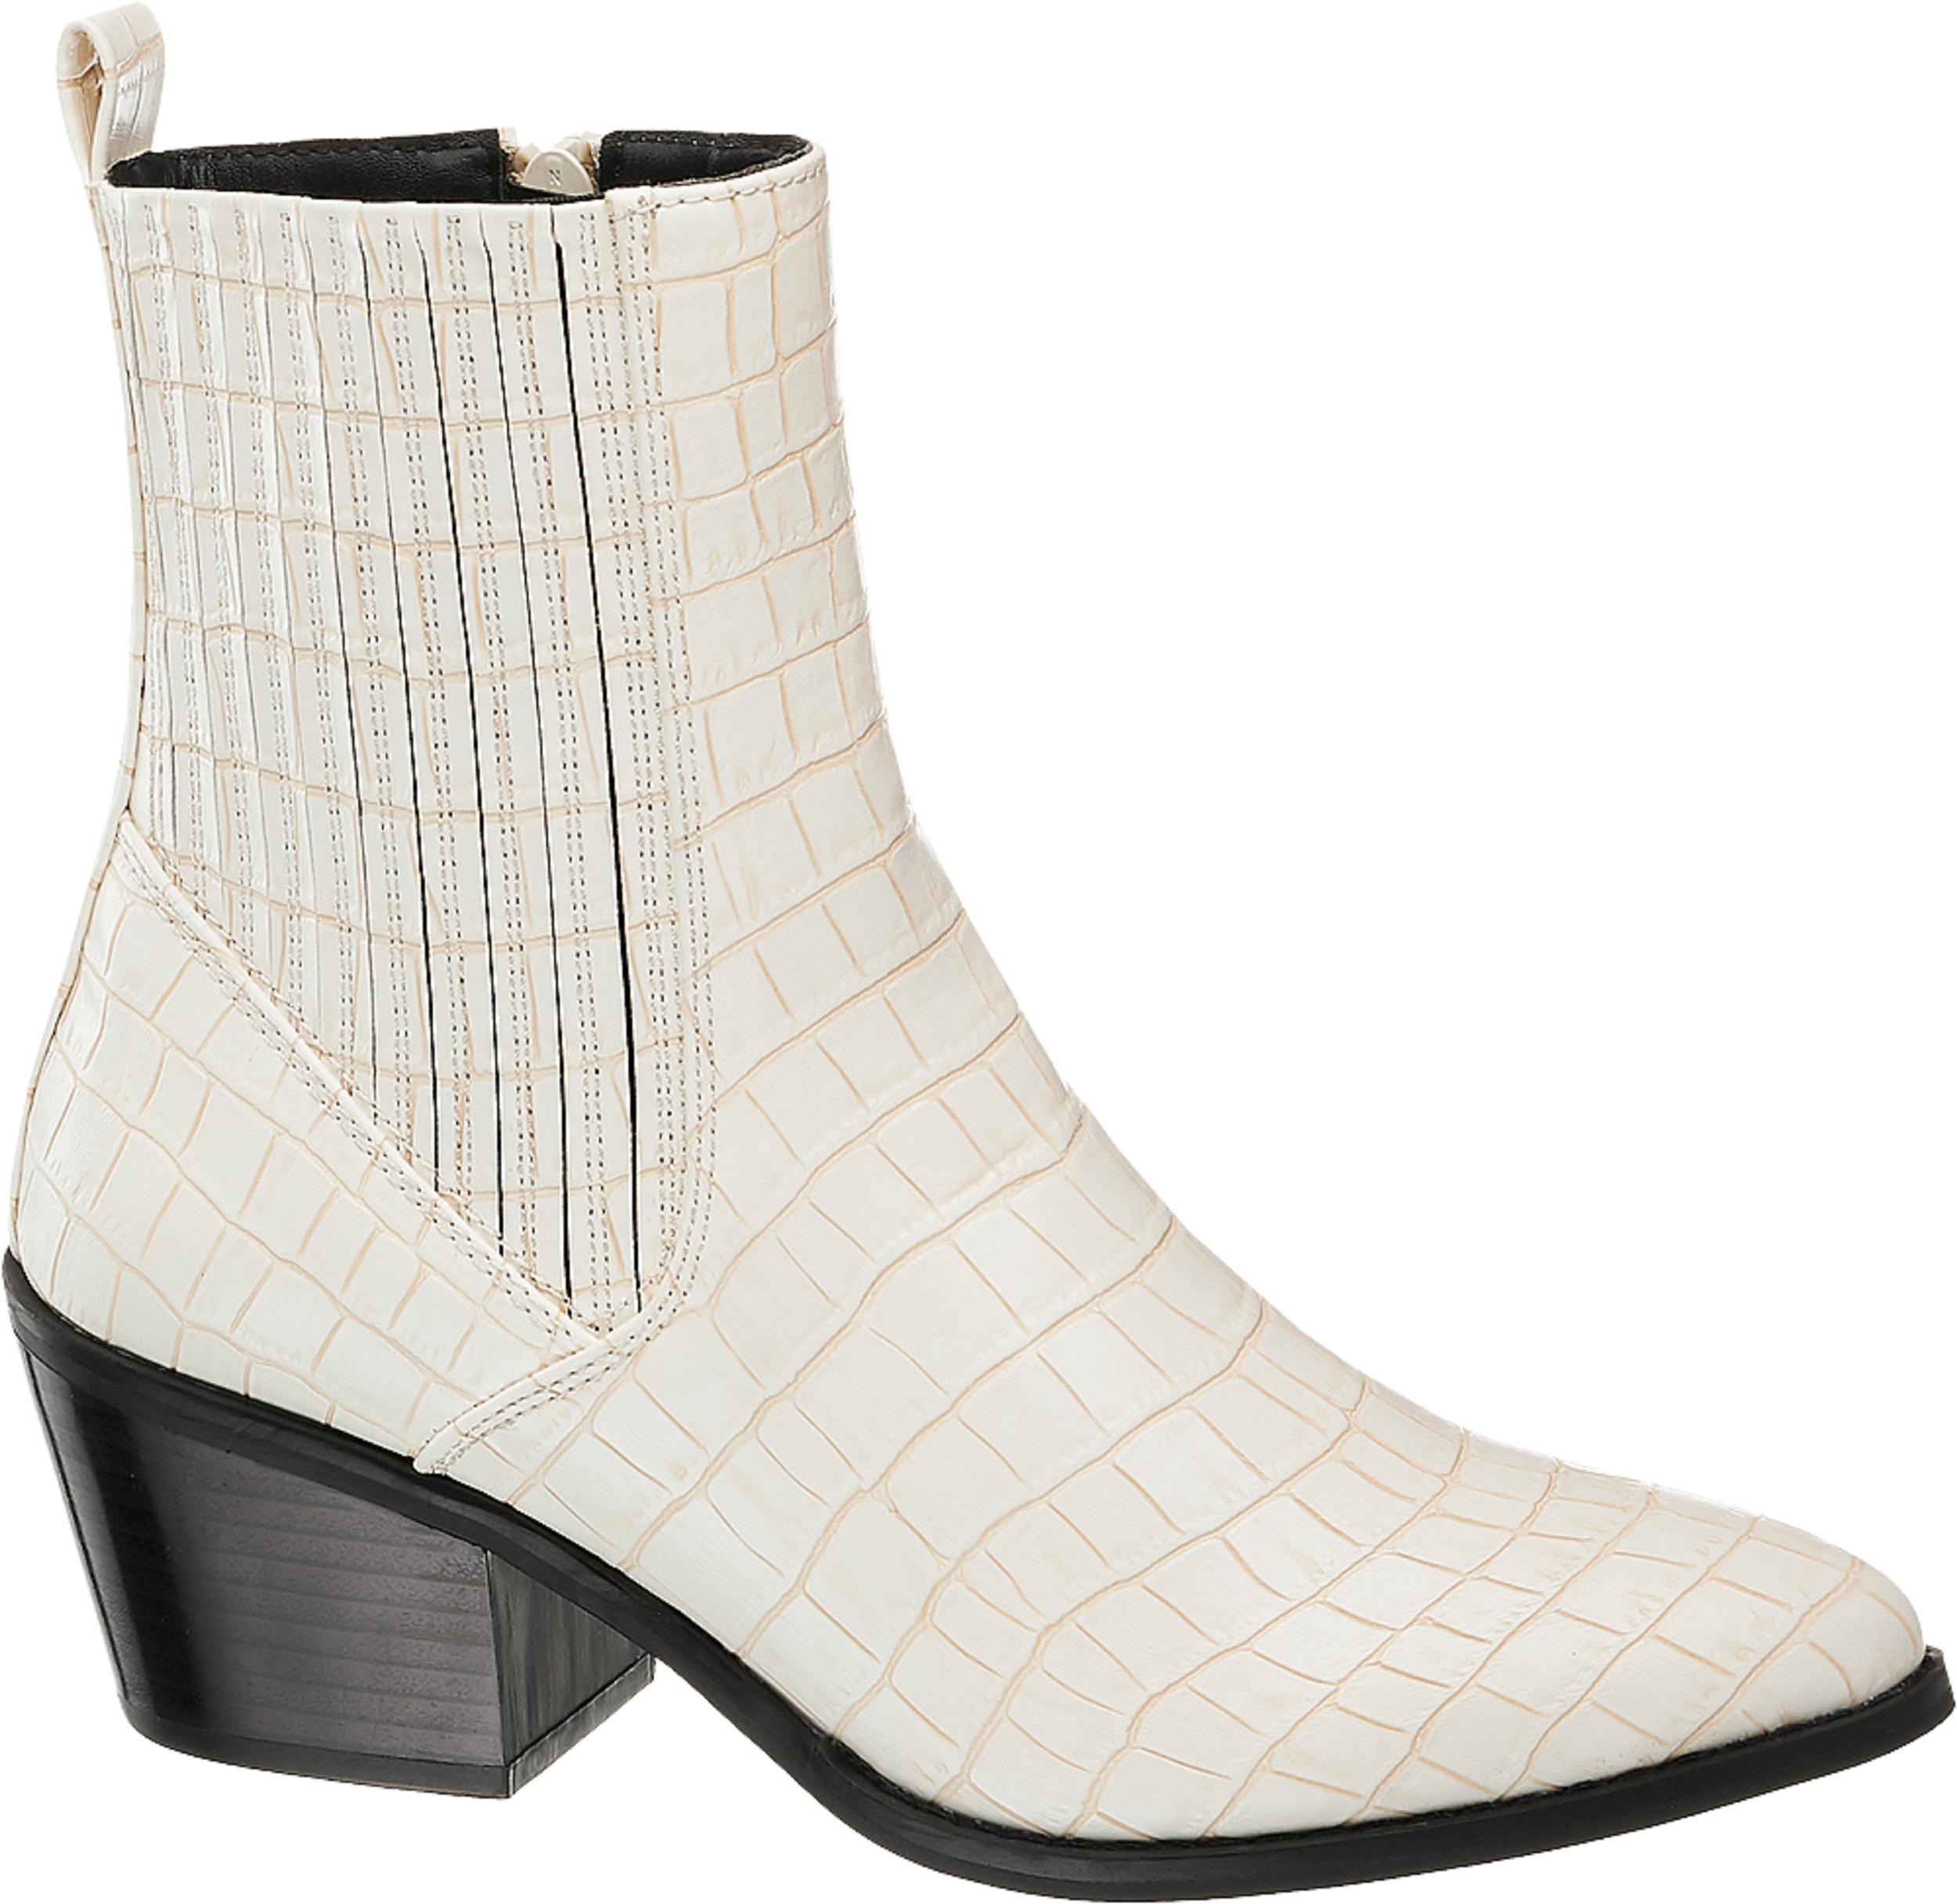 White Croc Vero Moda Toa  Western Ankle Boots, £49.99/AED225.65, Deichmann